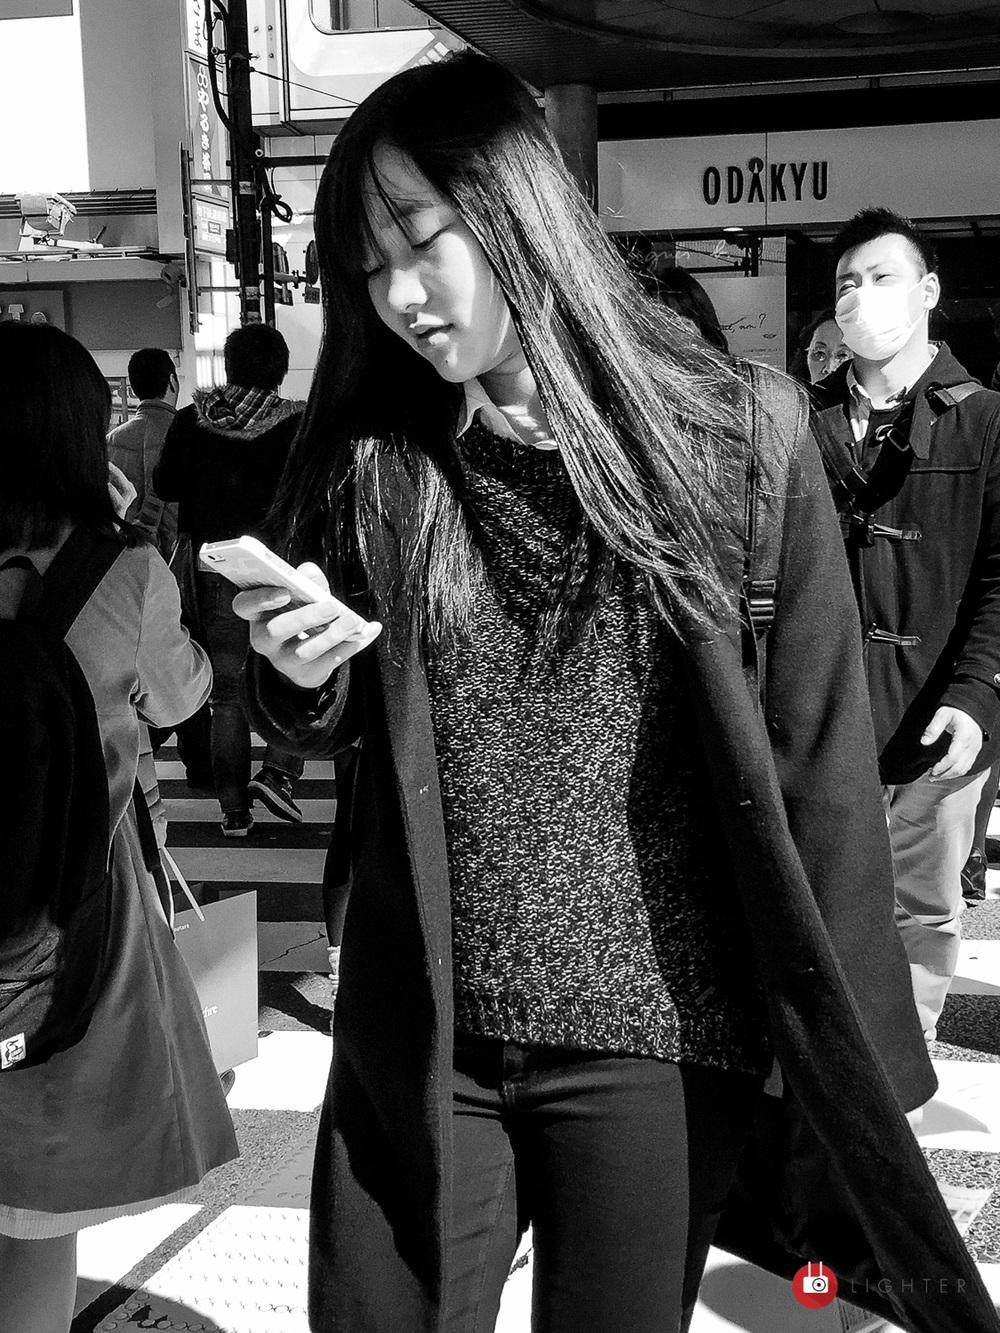 Shinjuku, Tokyo - iPhone 6 Plus, ISO 32, f/2.2, 1/1150 sec. Edited in Lightroom Mobile.